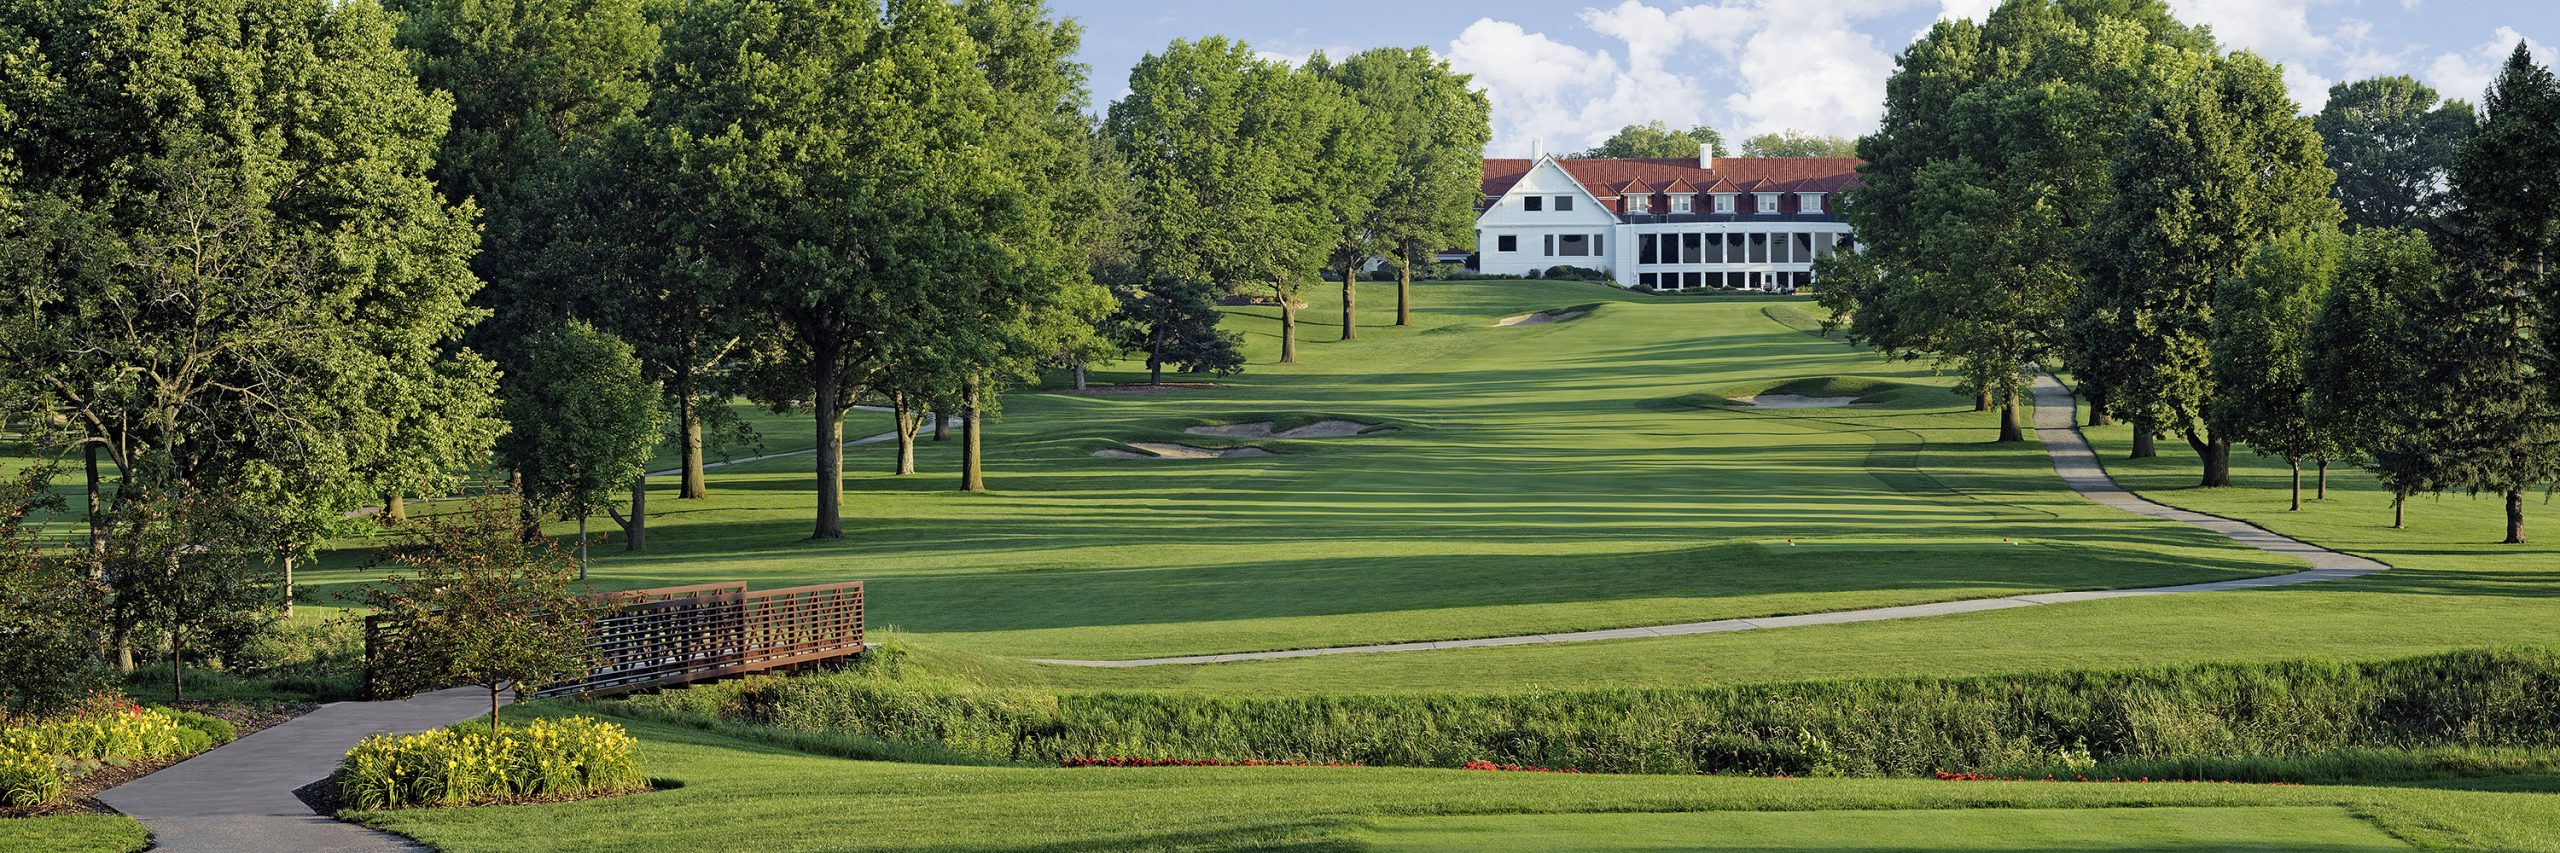 Golf Course Image - U.S. Hickory Open 2020 – Happy Hollow Club No. 9